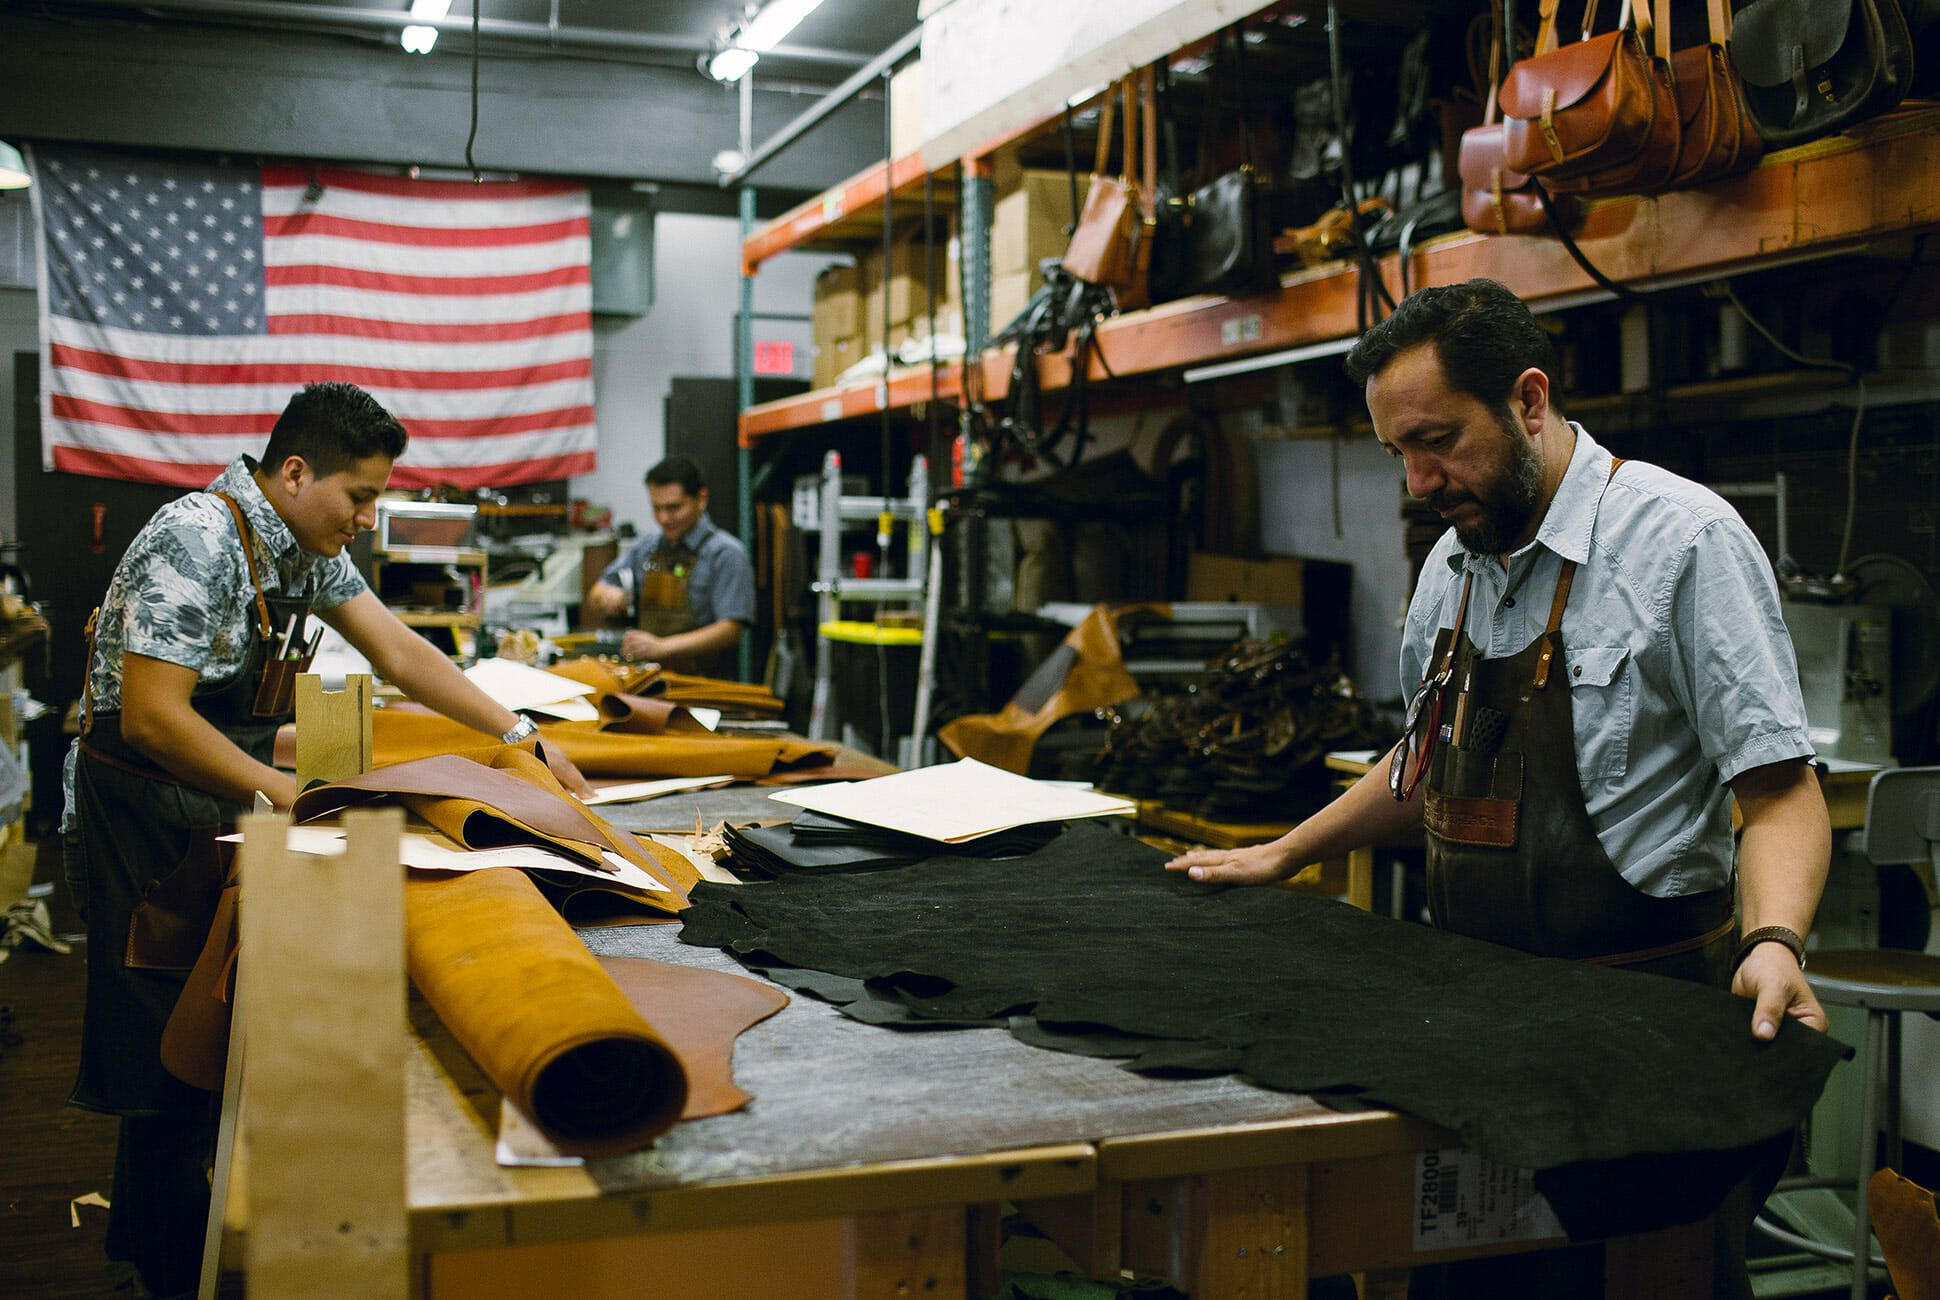 Orox Leather Company